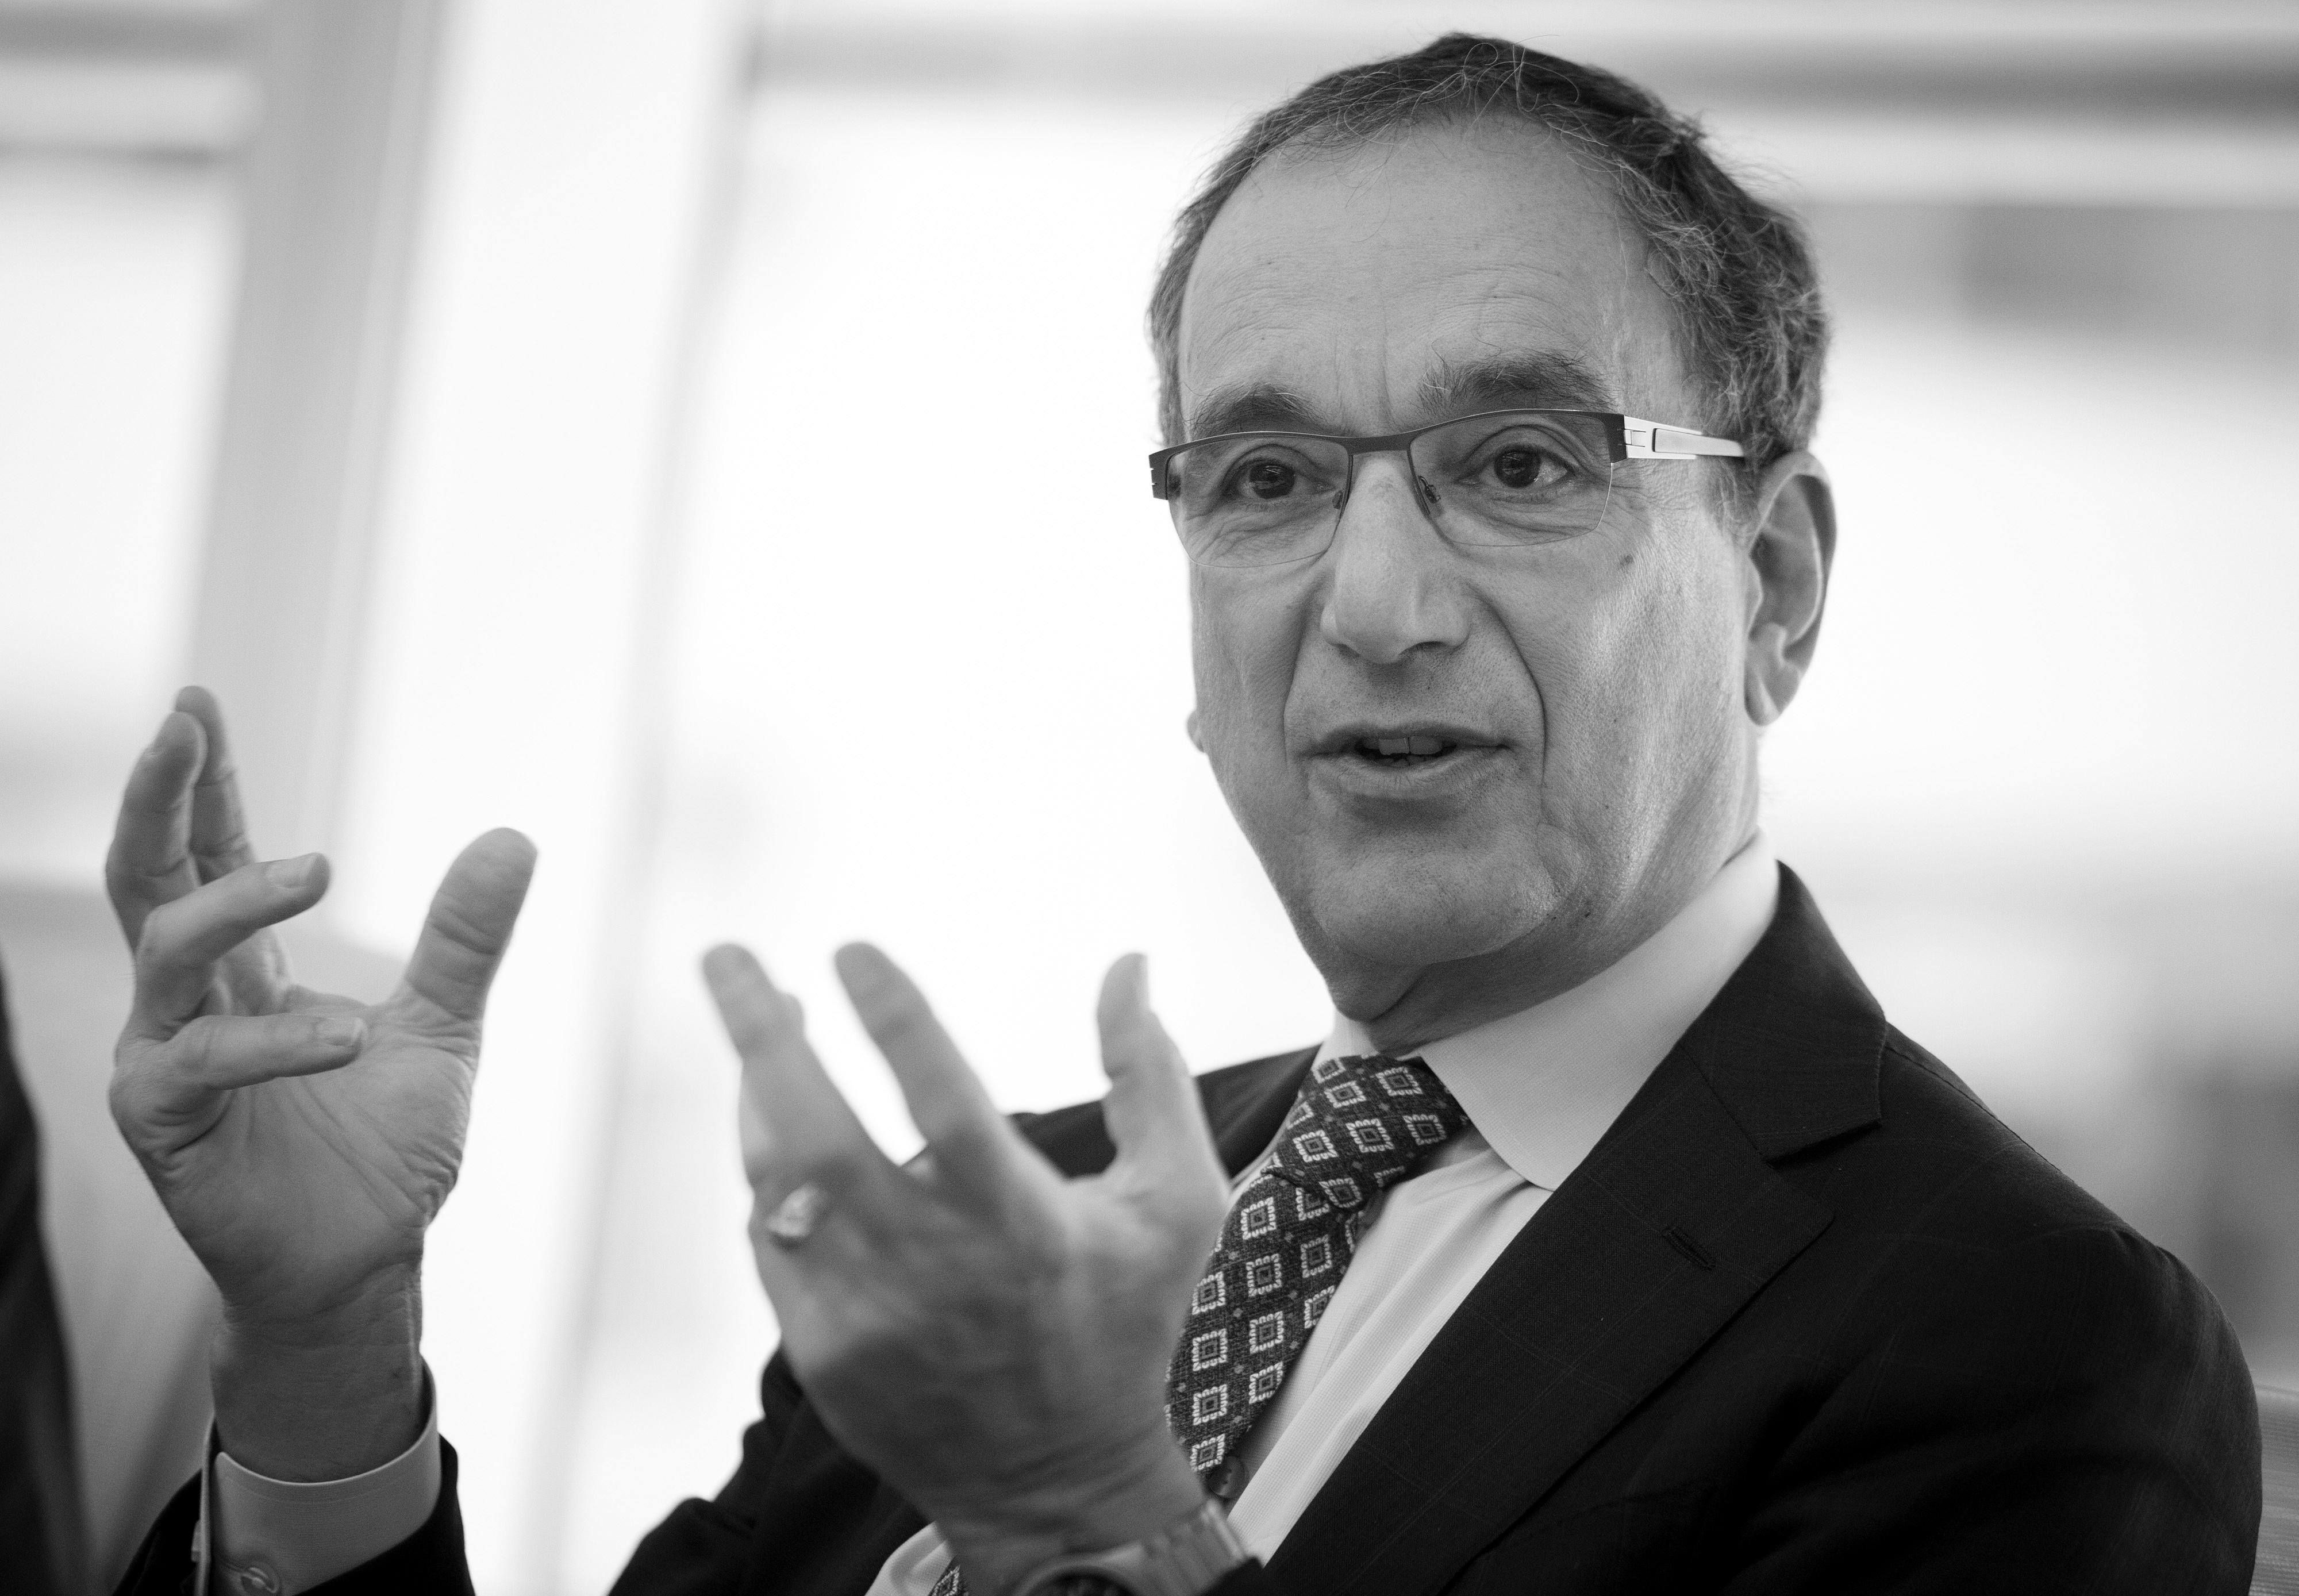 Biogen Idec Inc. CEO George Scangos Interview